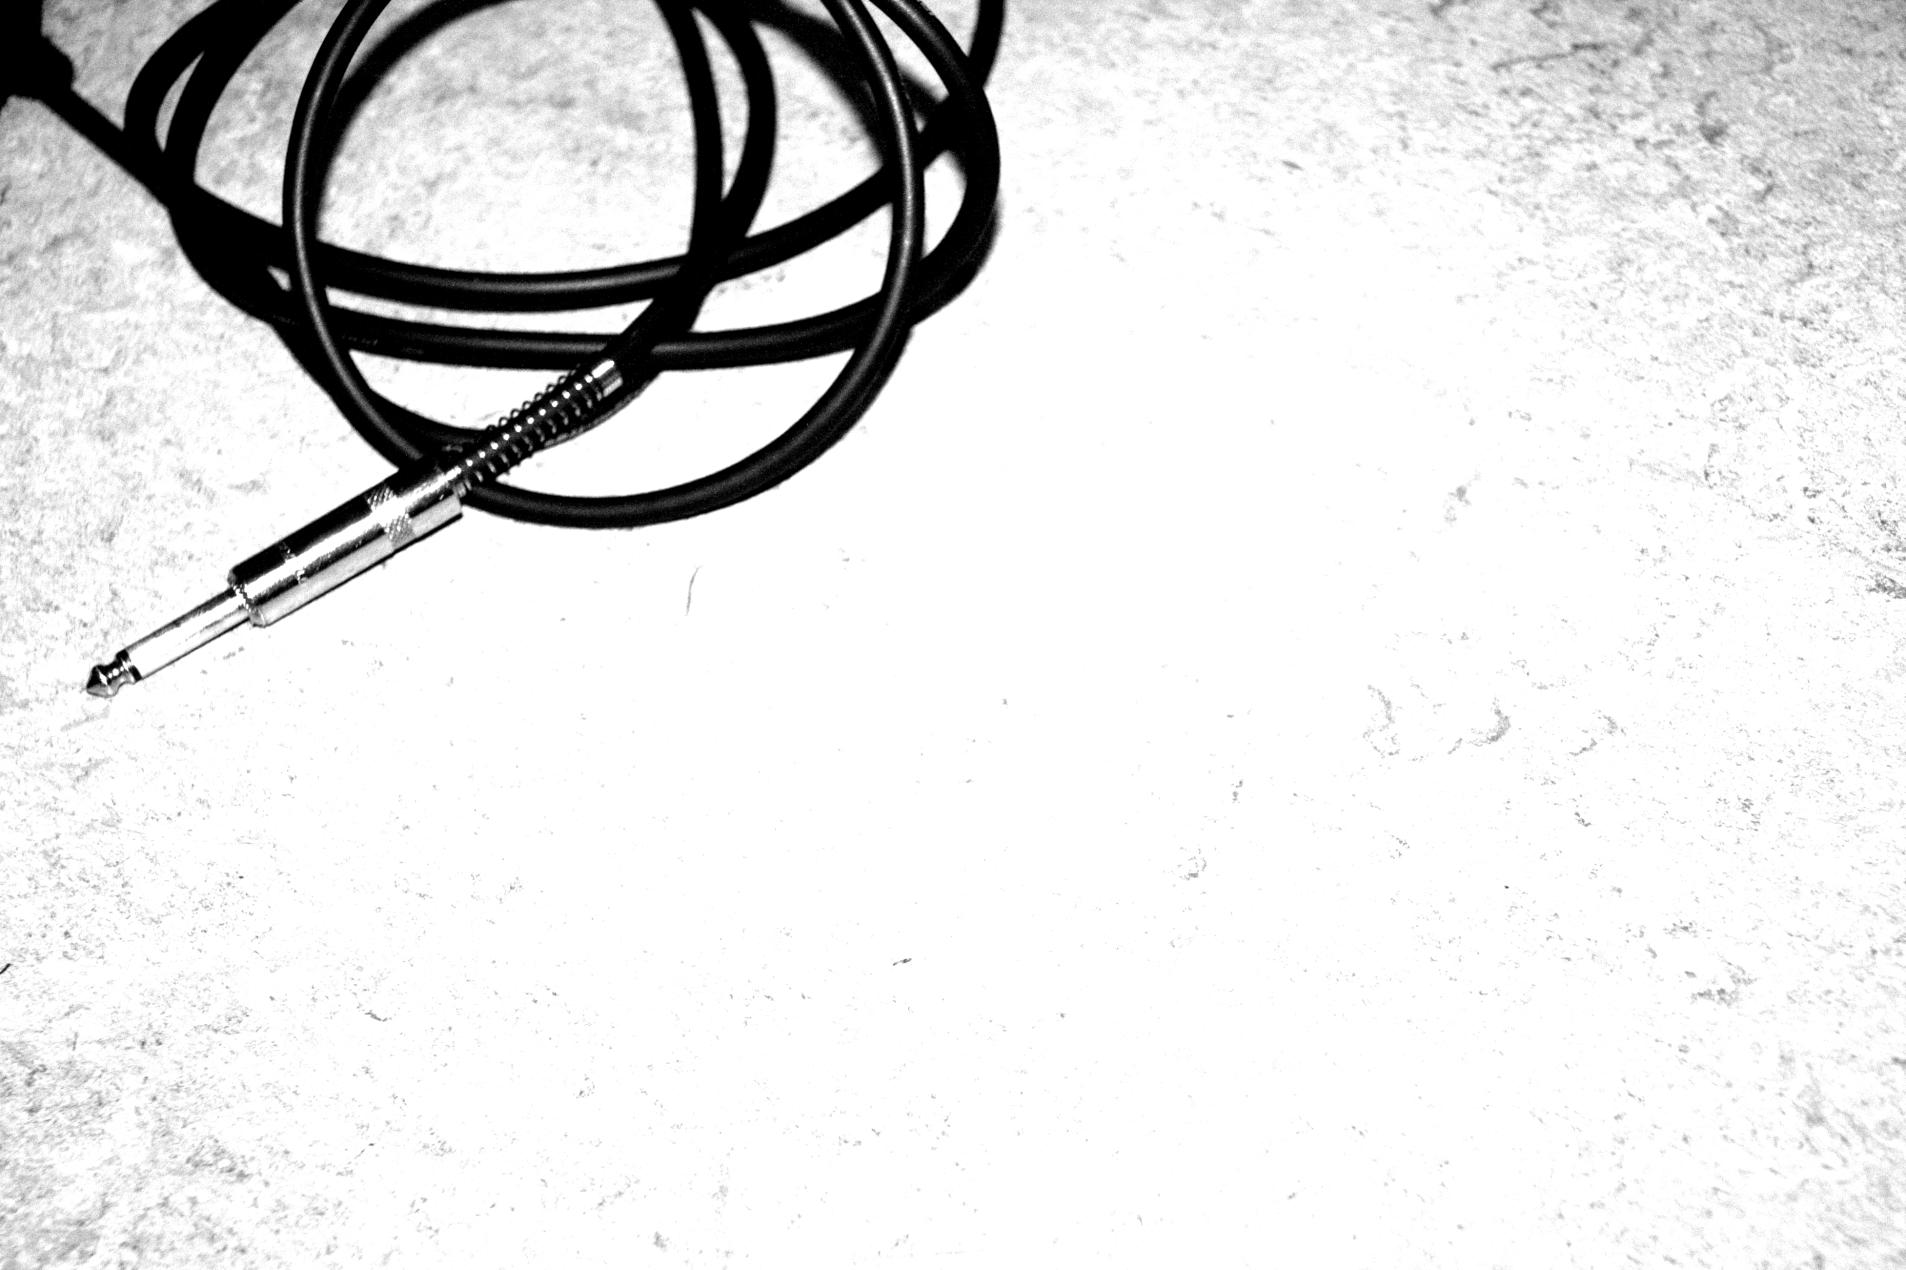 gitarrenkabel.